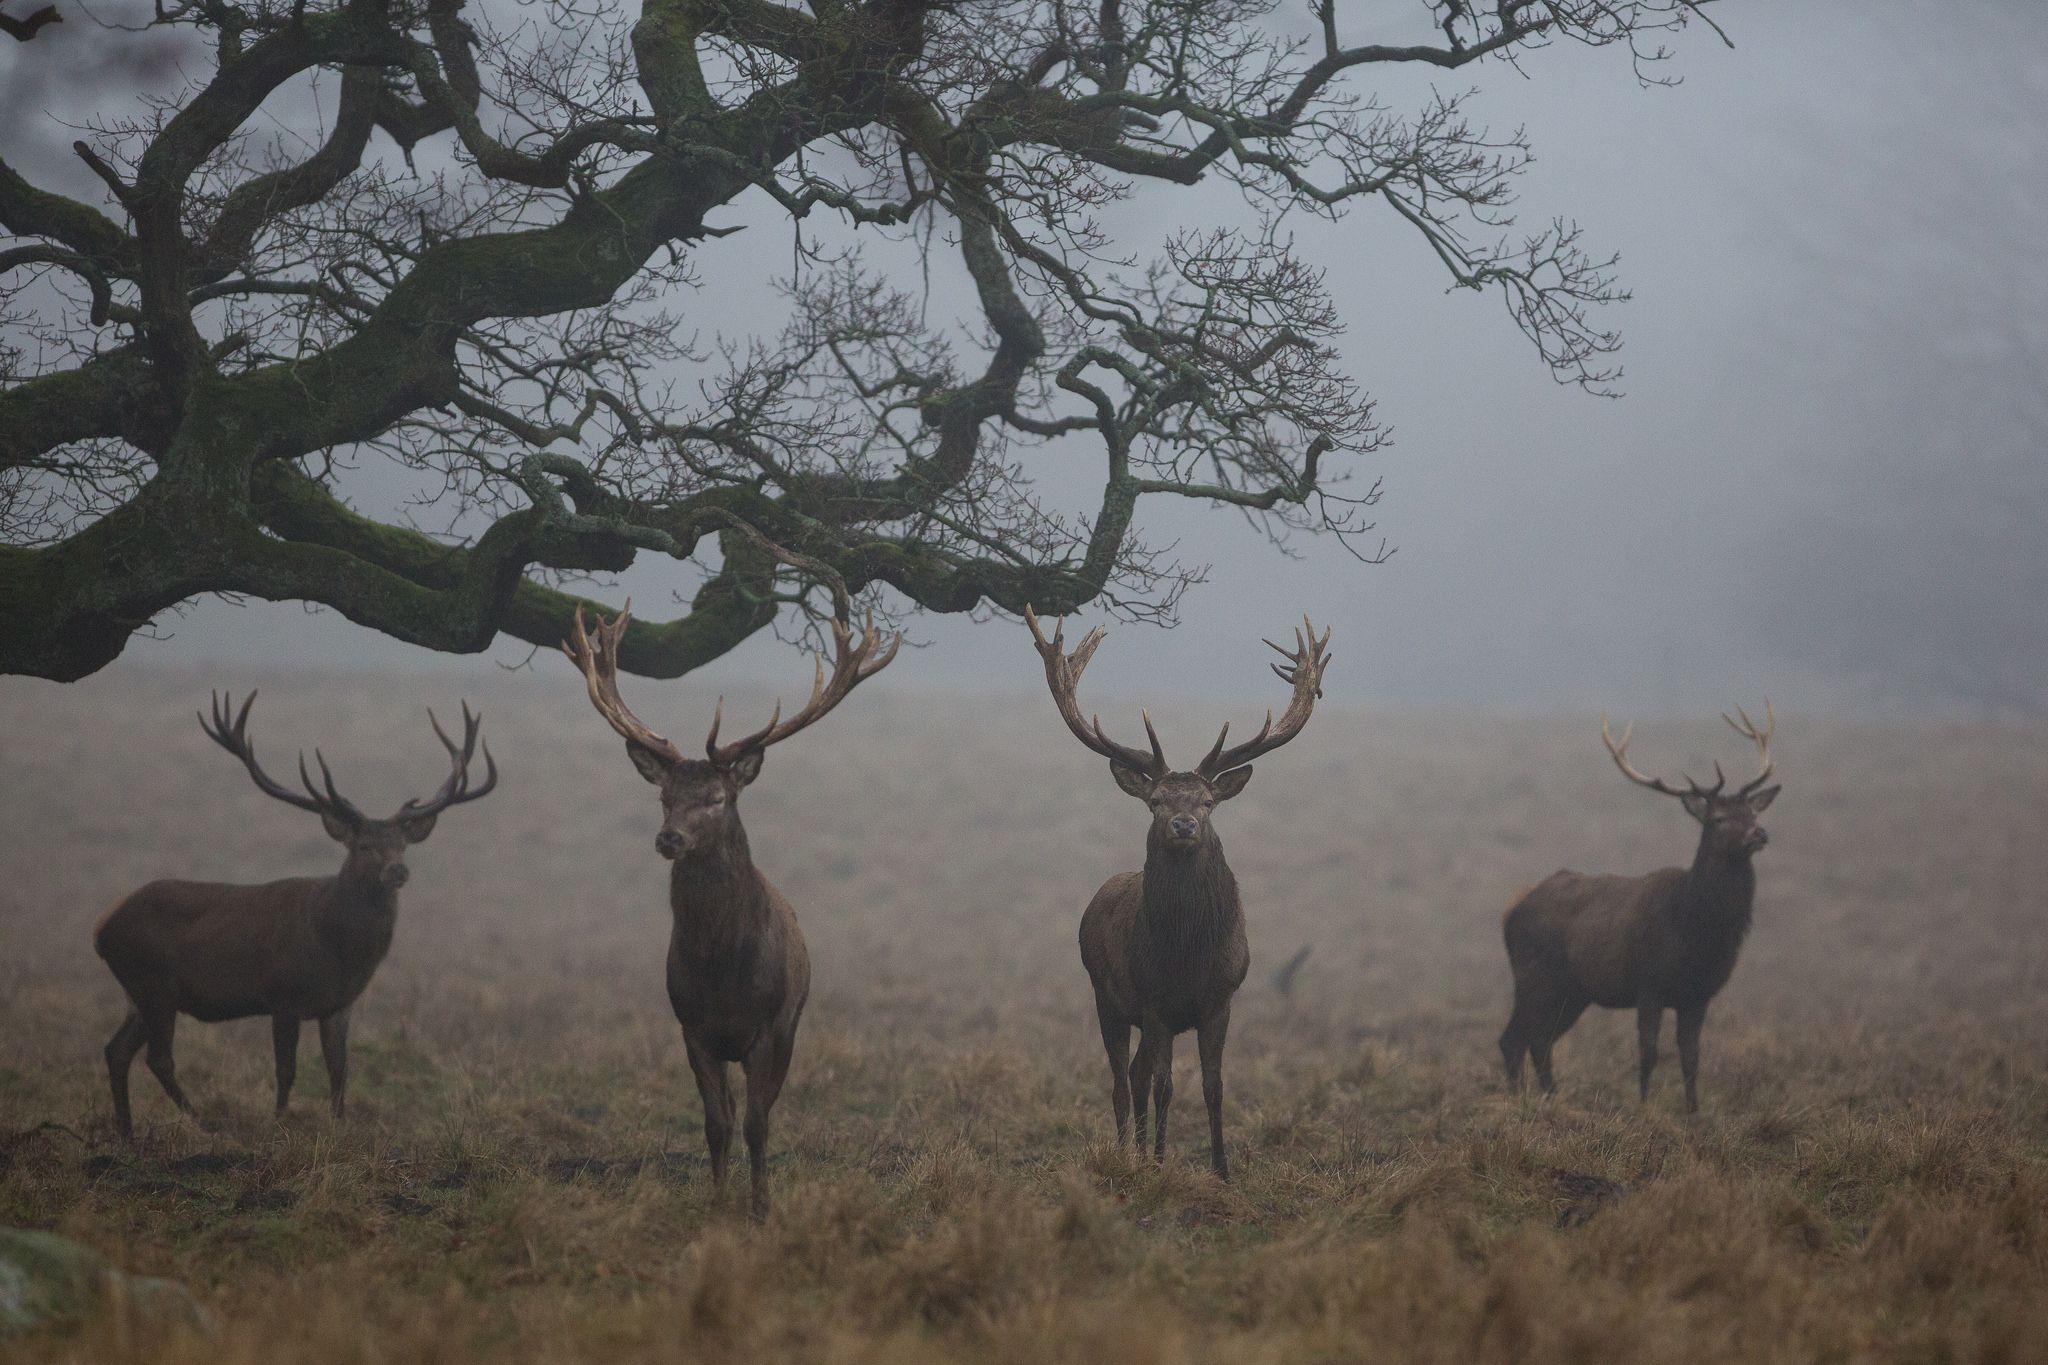 Red Deer Nature Dark Aesthetic Animals Dawn forest deer trees fog nature